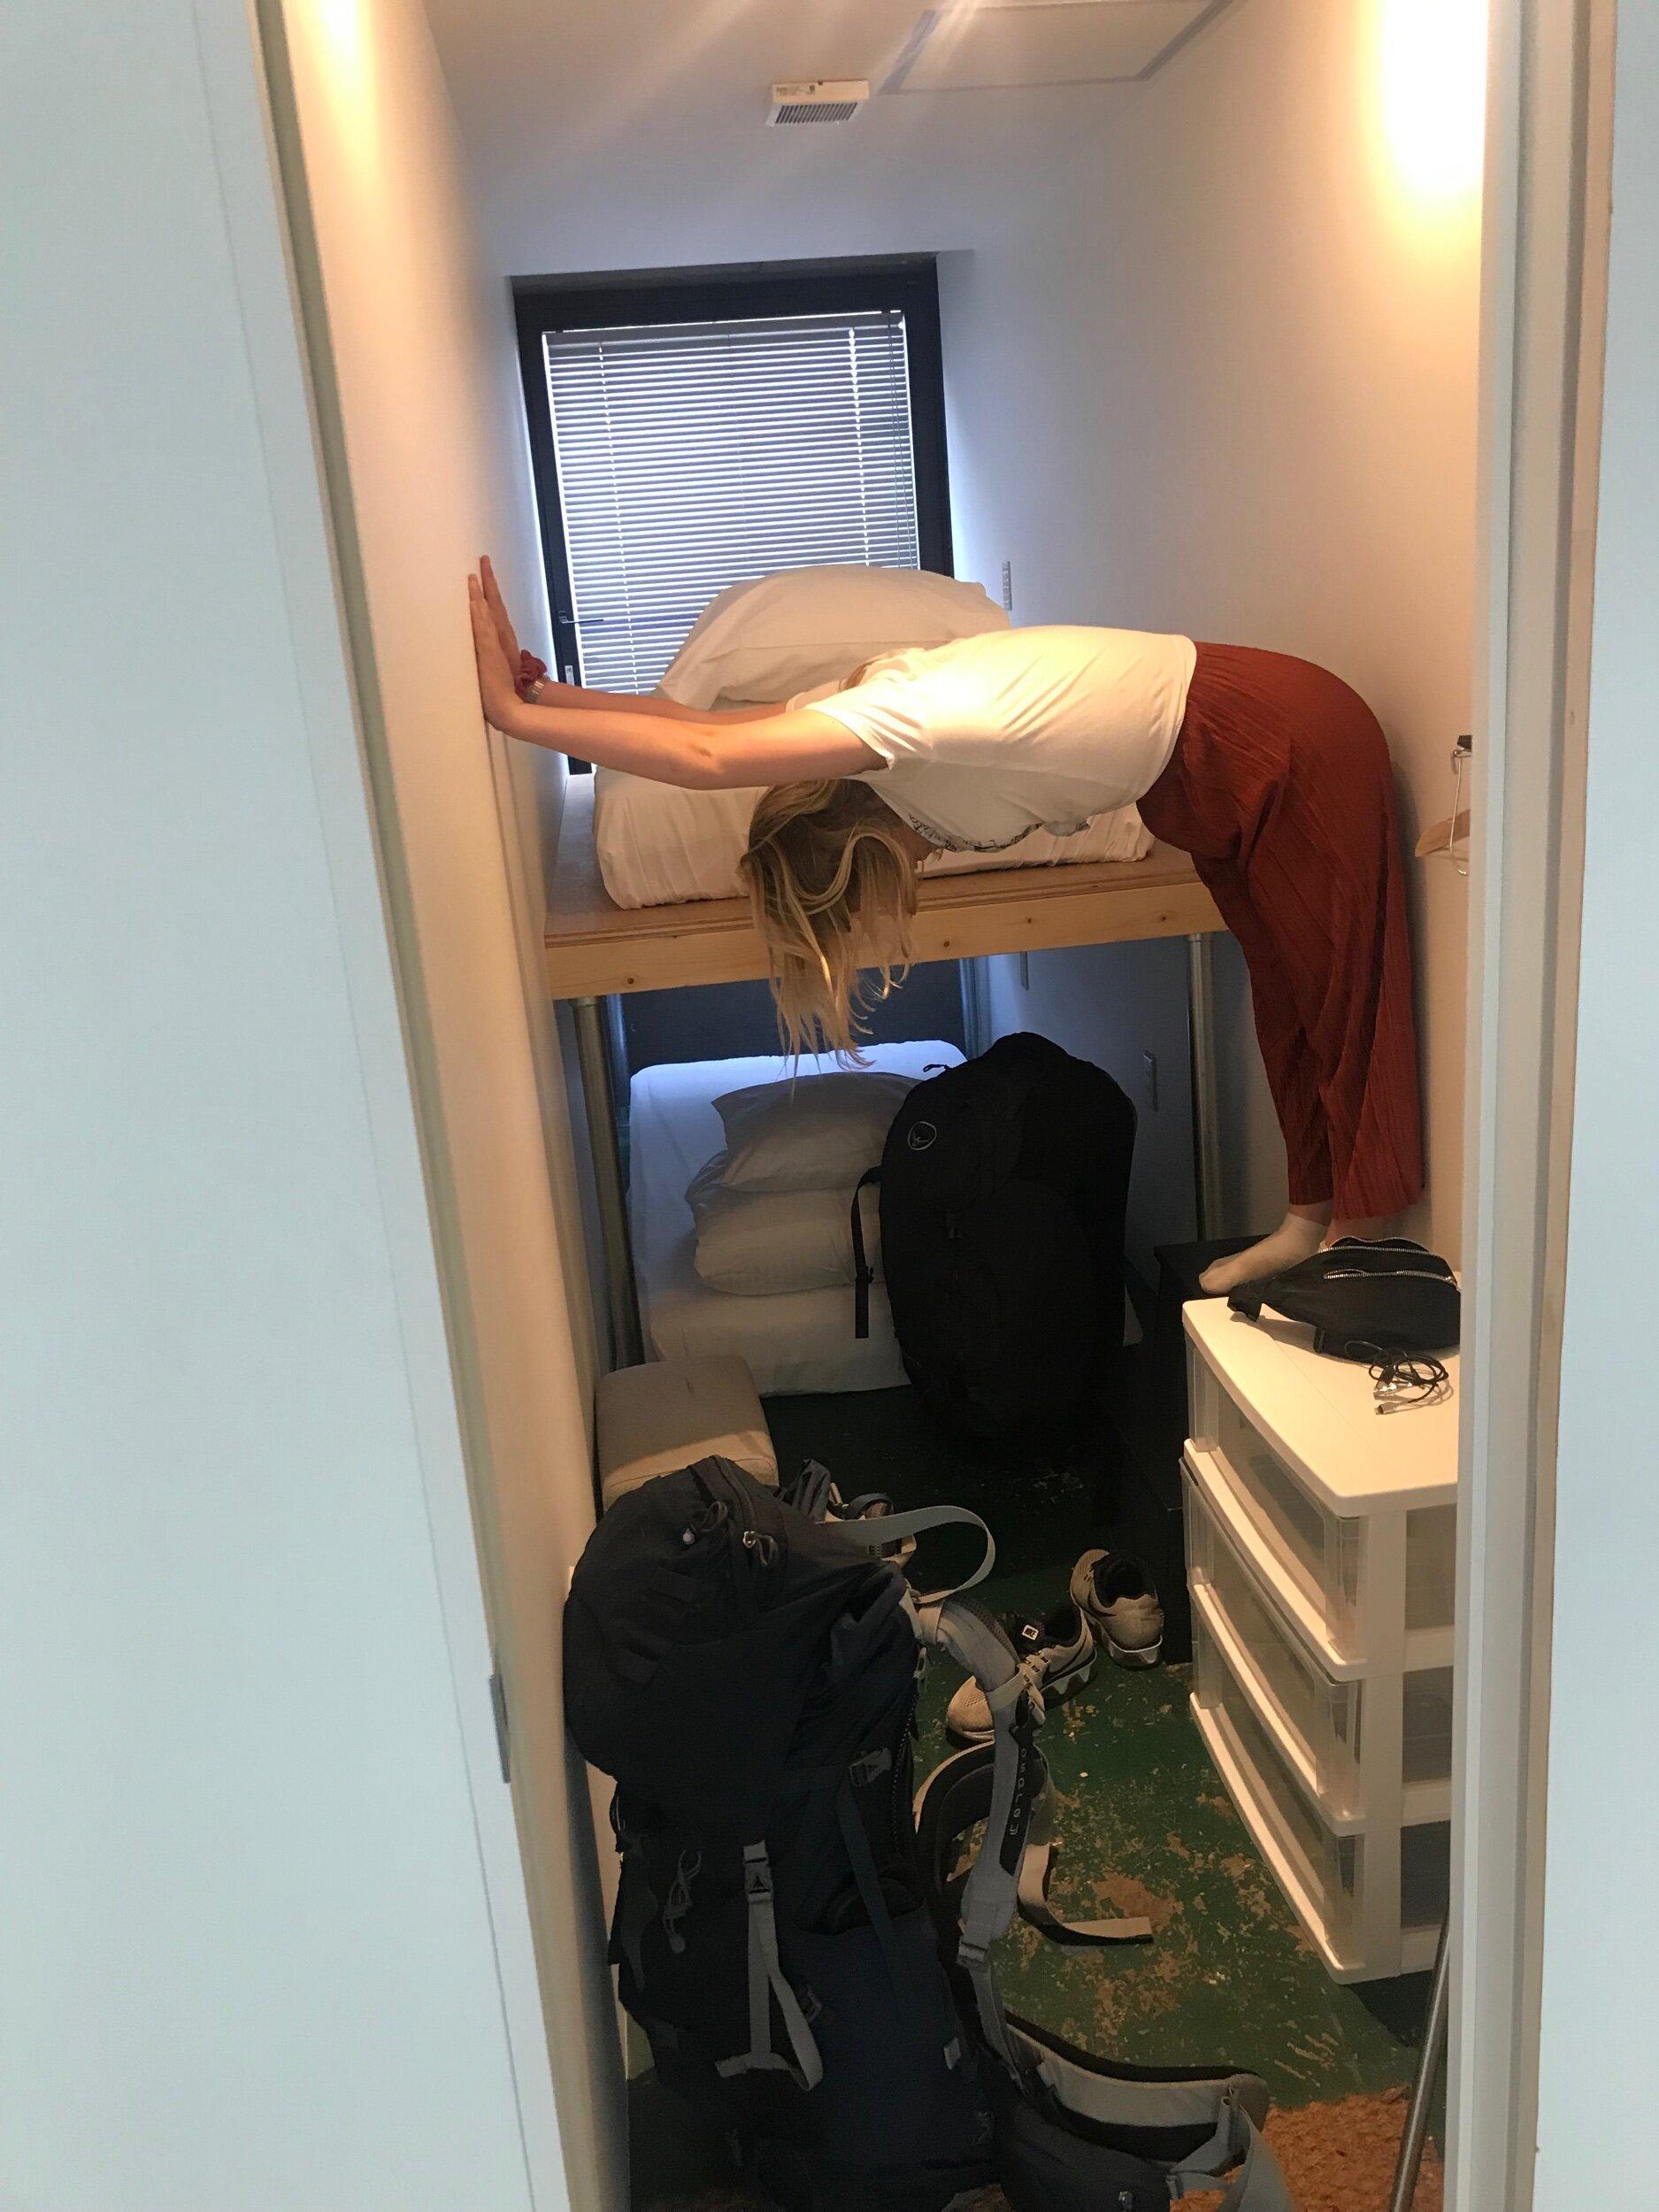 Alisha holding the room together